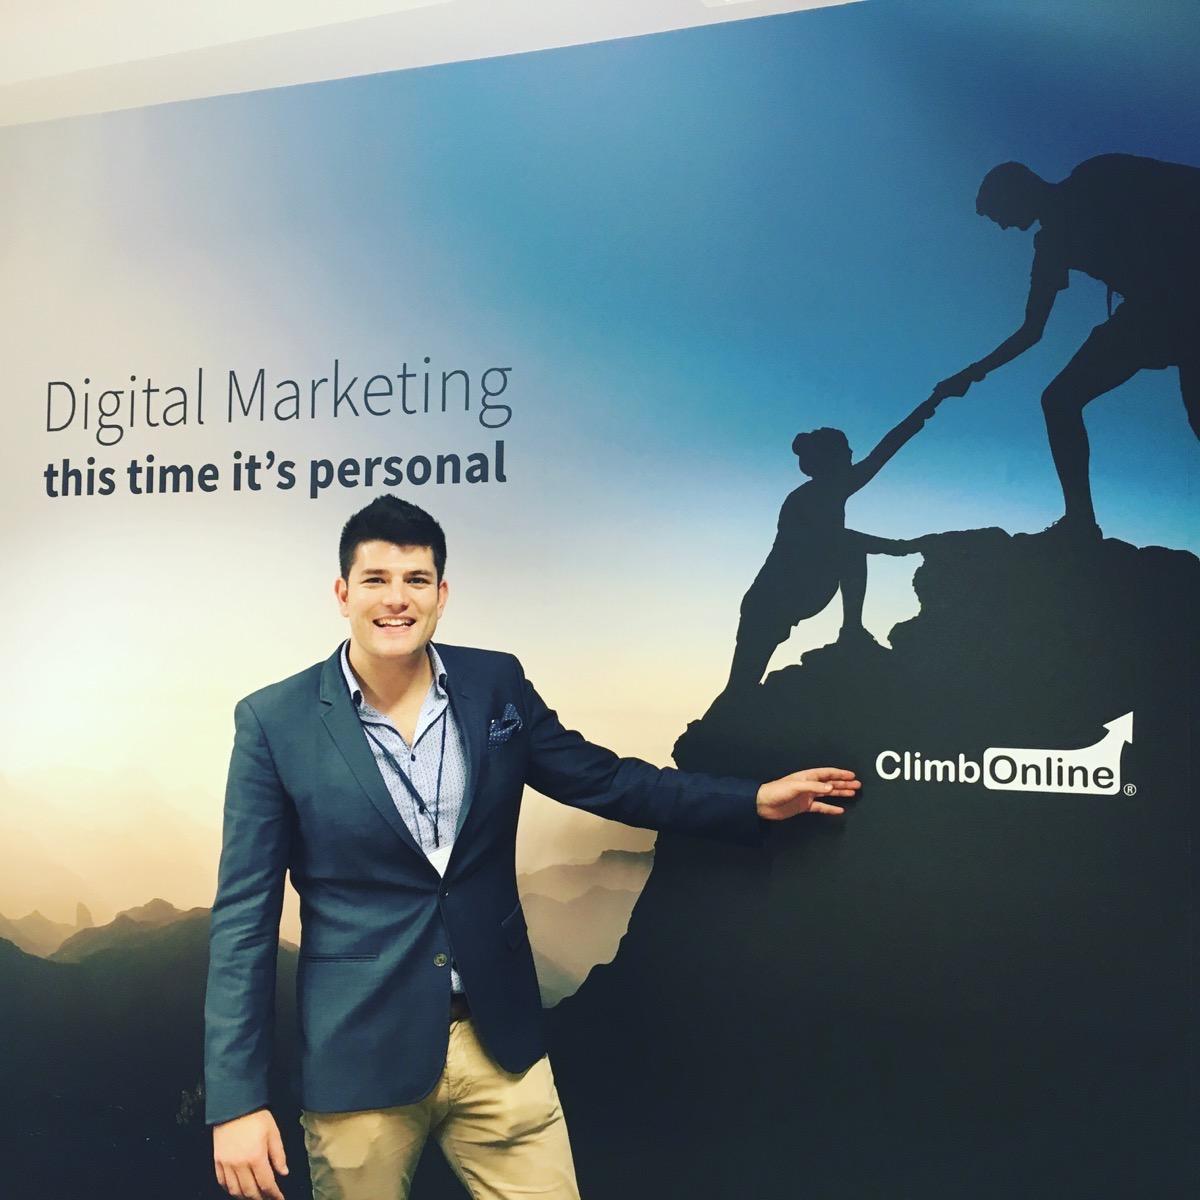 Mark Wright: Digital marketing and business development